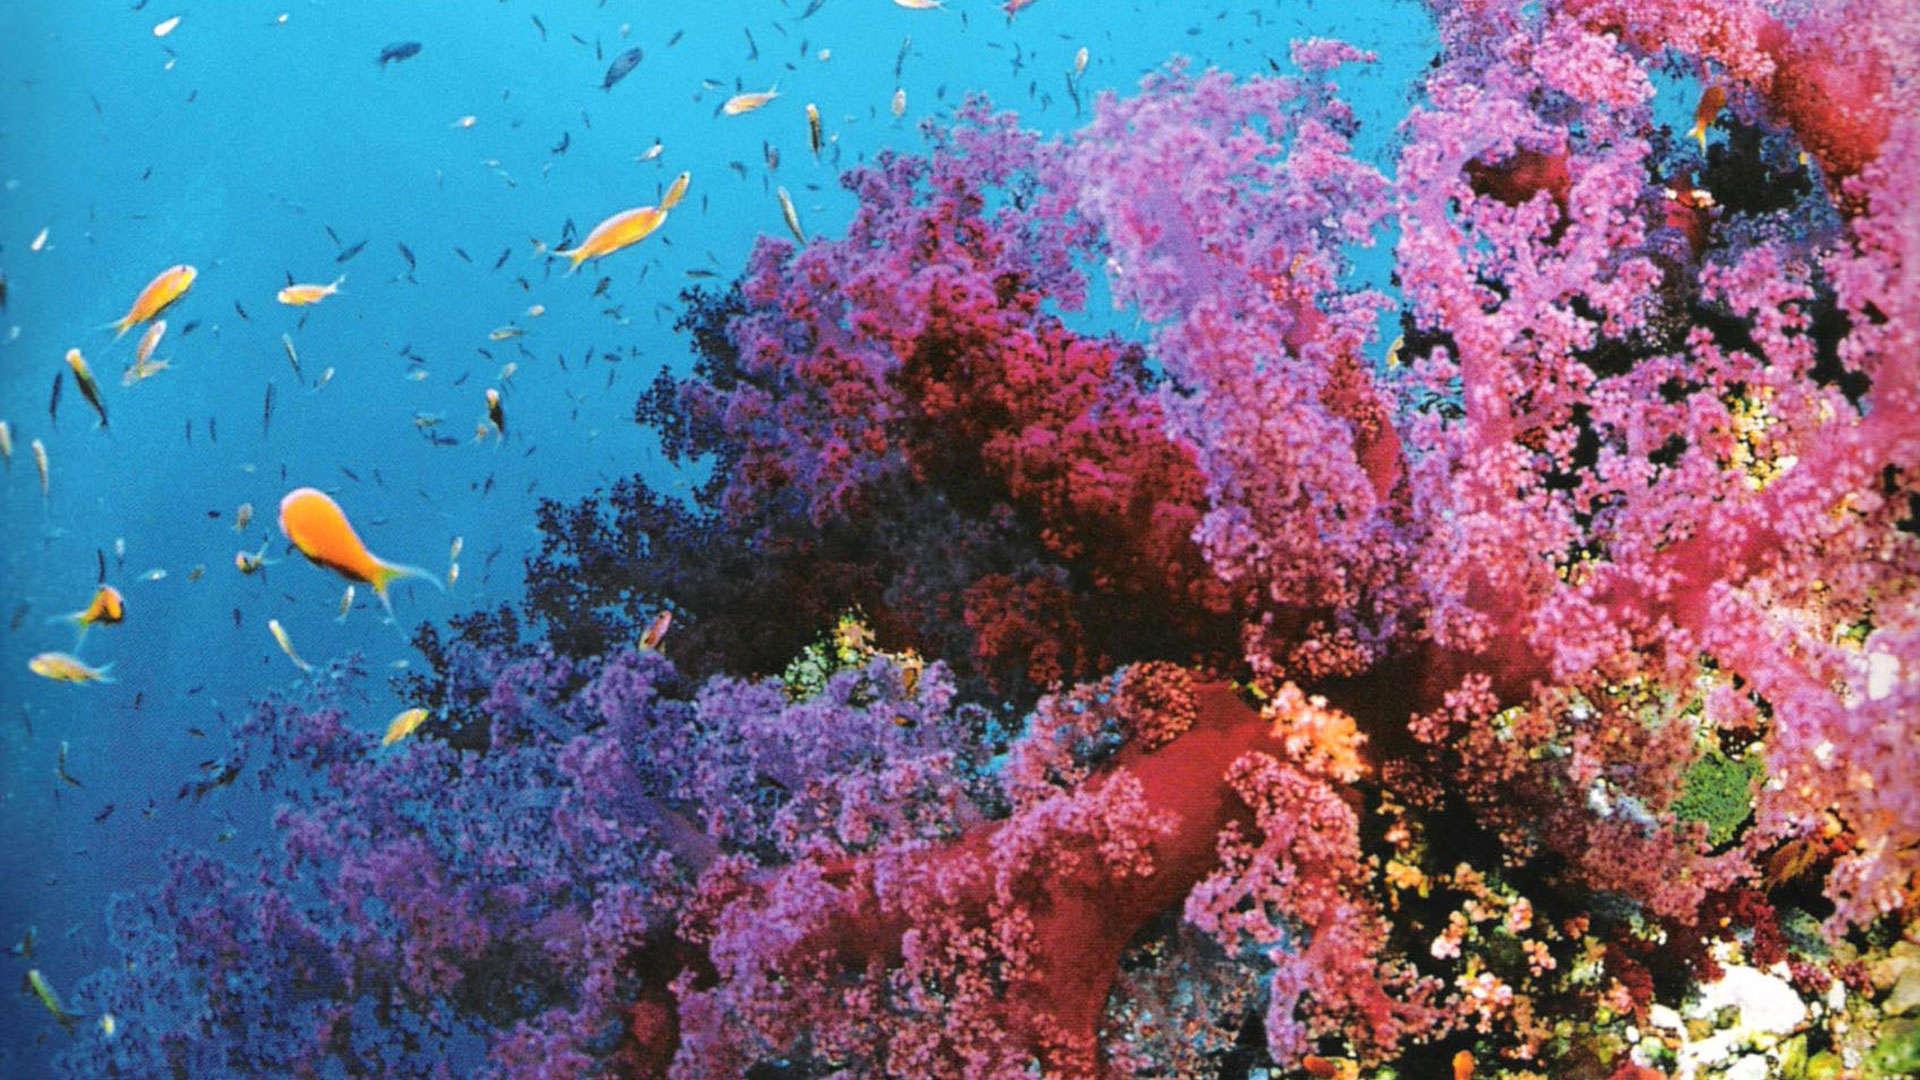 Great Barrier Reef Wallpaper Wallpapersafari HD Wallpapers Download Free Images Wallpaper [1000image.com]